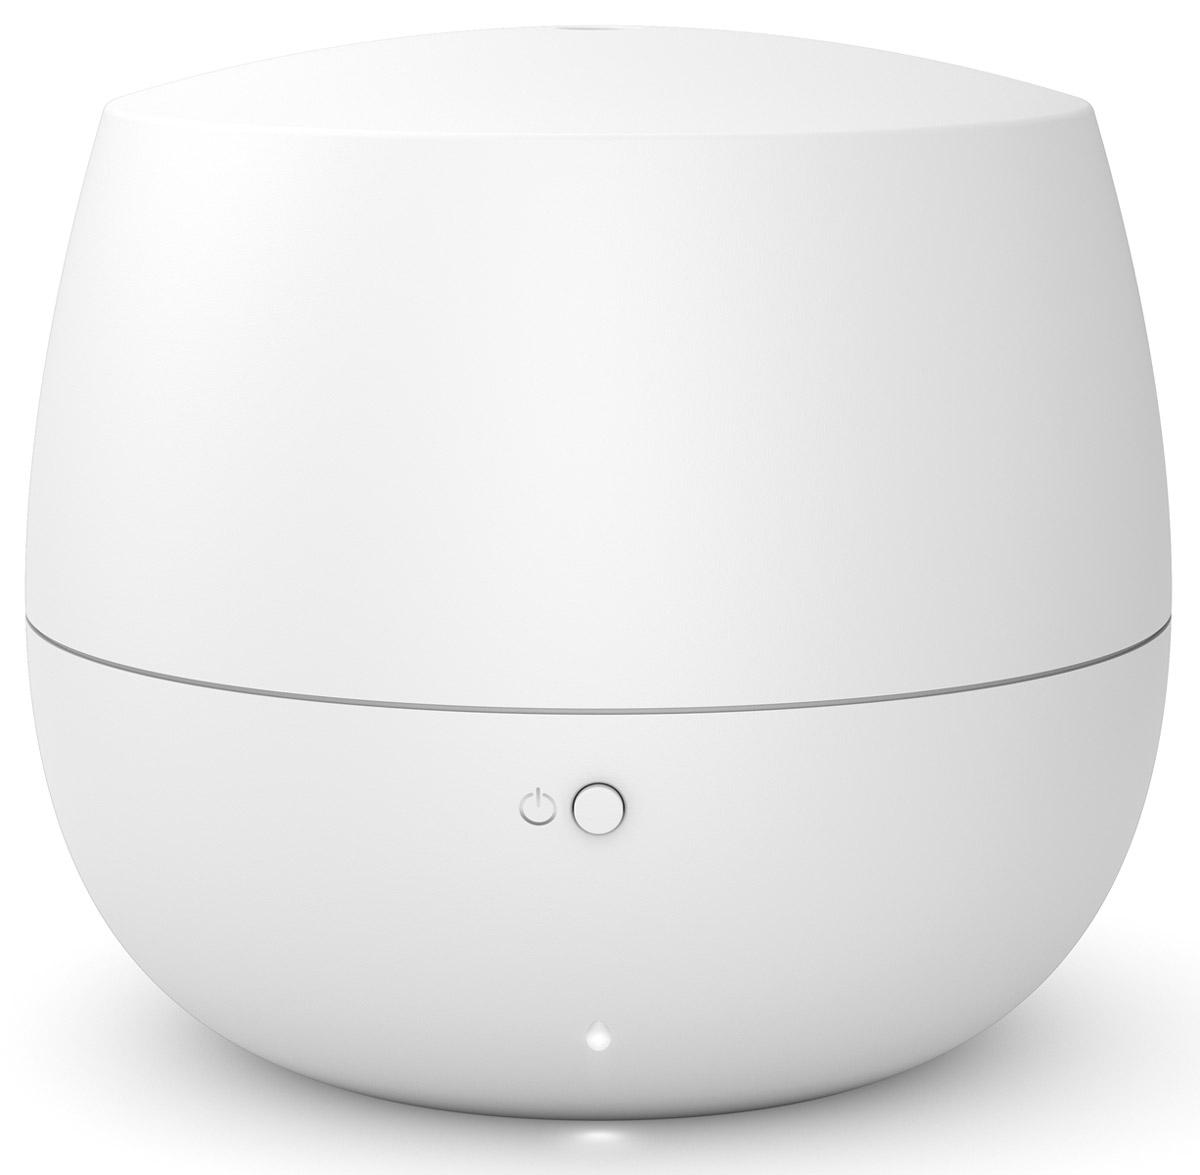 Stadler Form Mia, White ароматизатор воздуха - Бытовые аксессуары